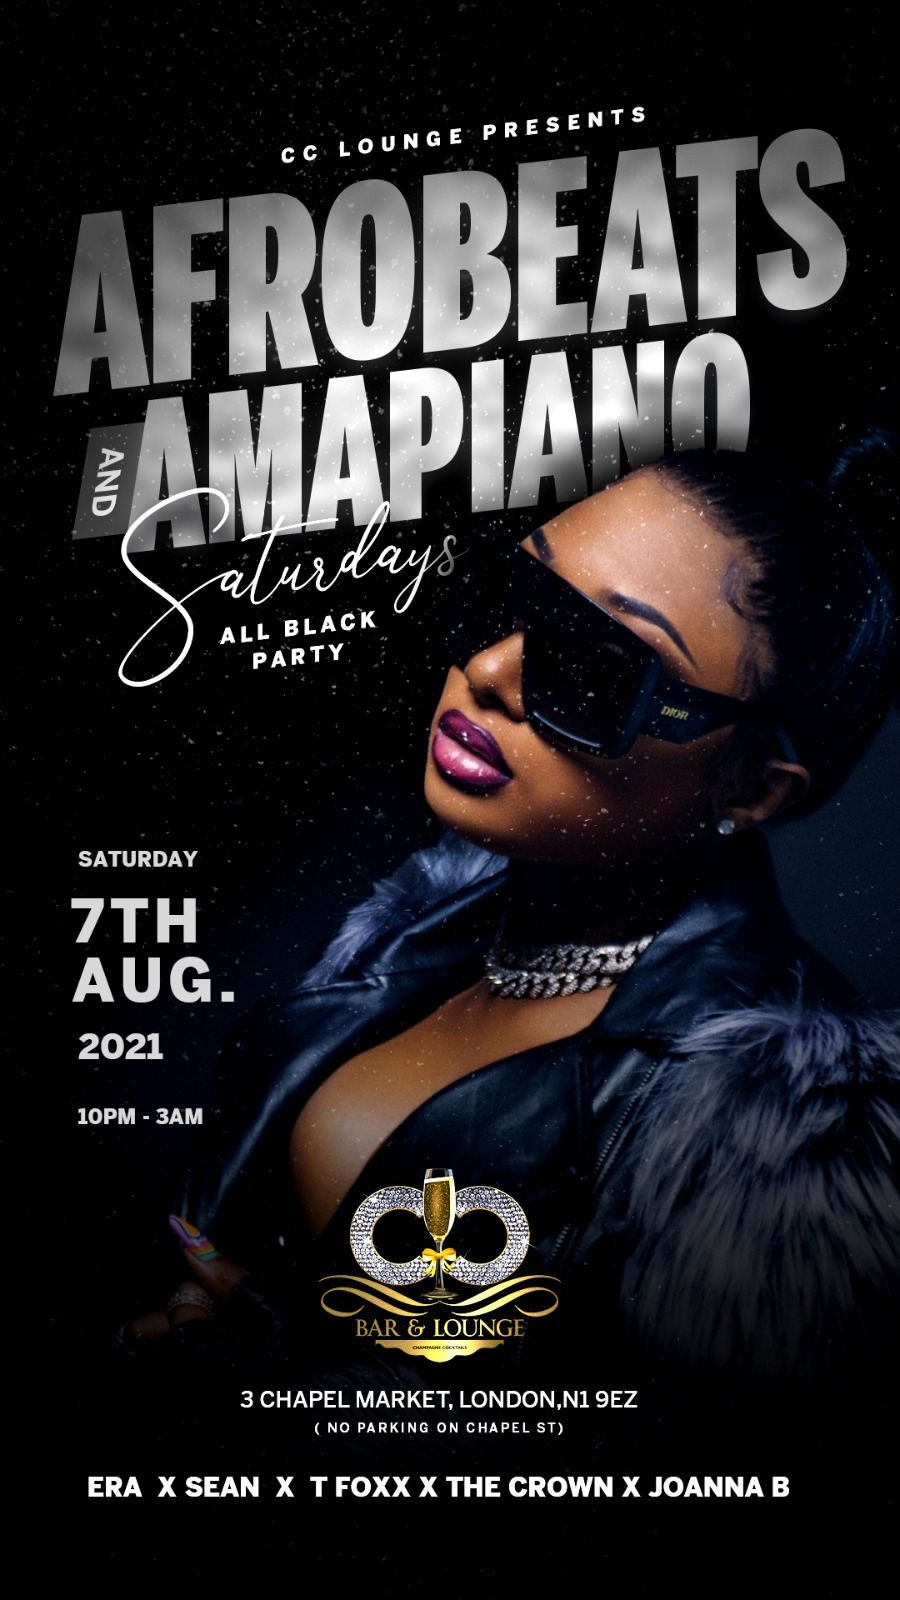 AFROBEATS & AMAPIANO SATURDAYS (ALL BLACK PARTY)